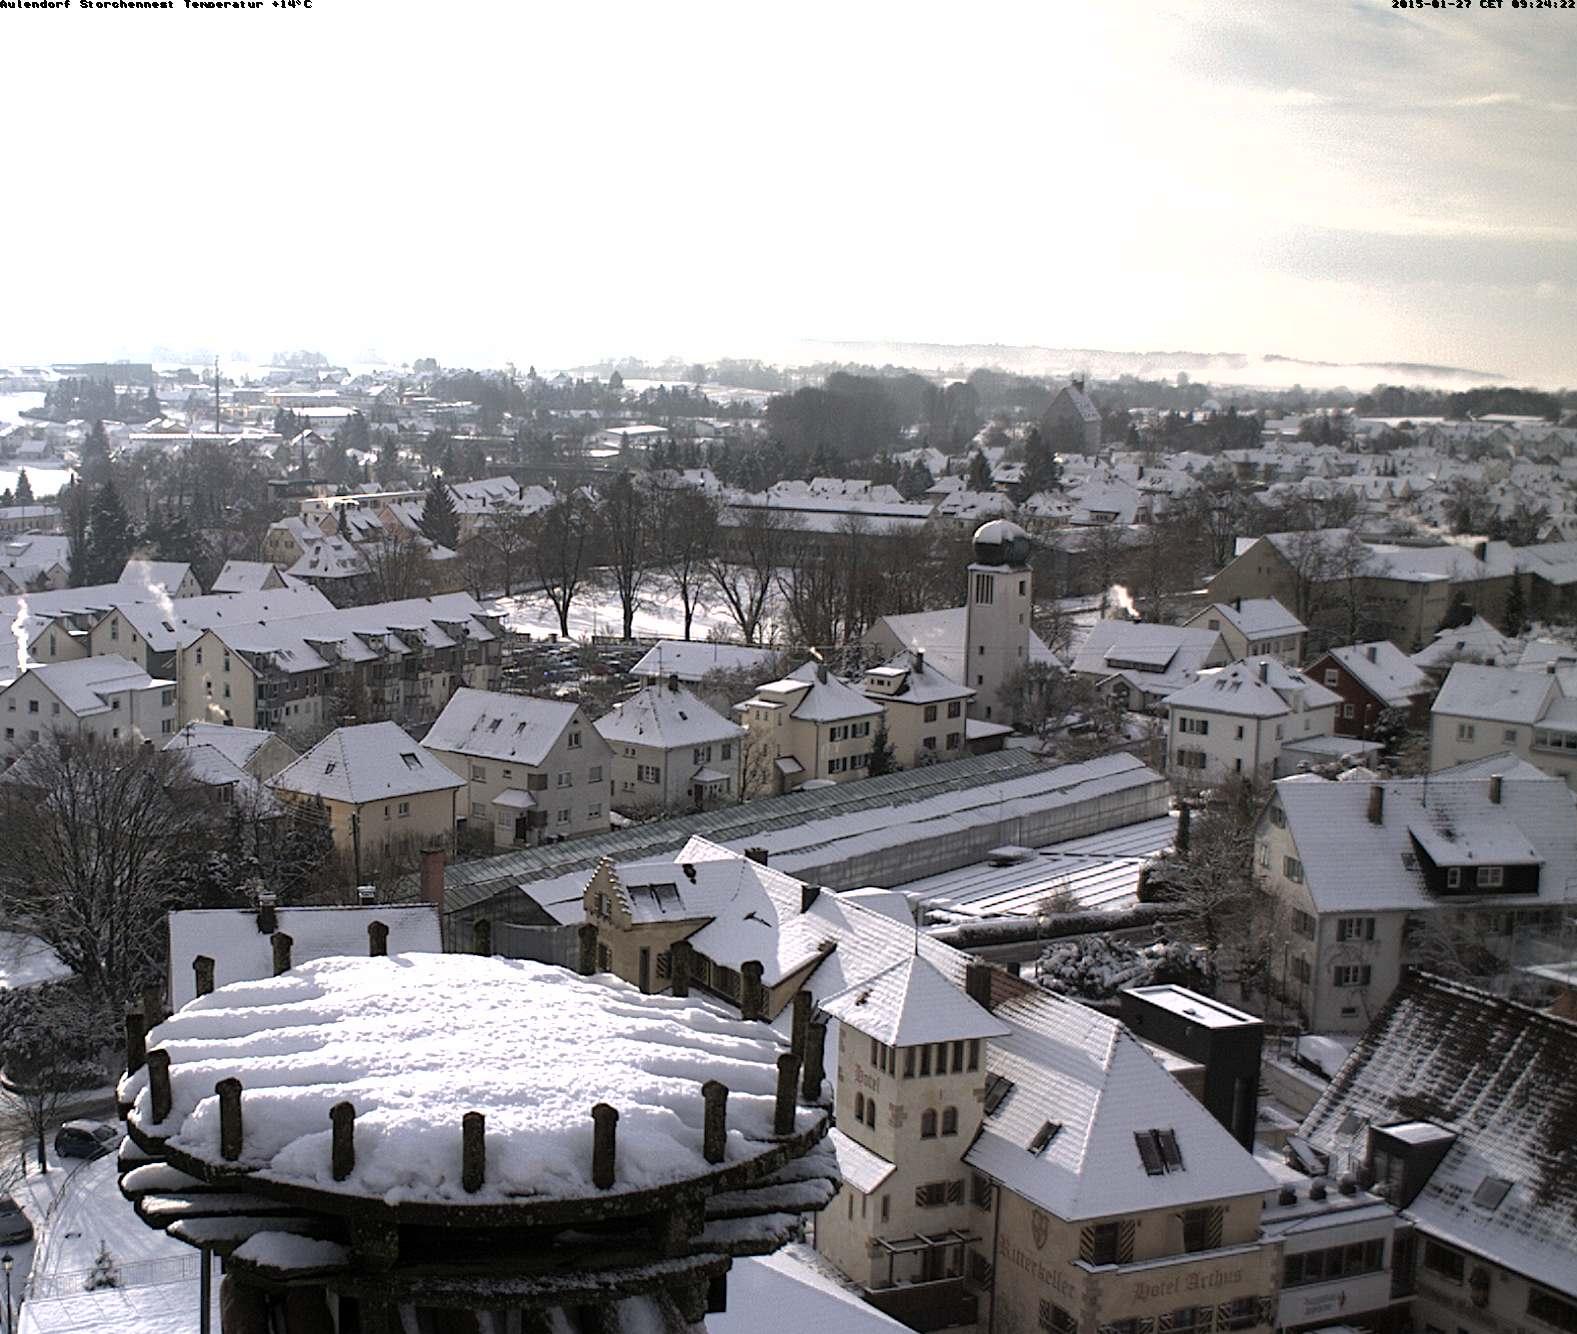 Aulendorf Skyline (and Stork Net)